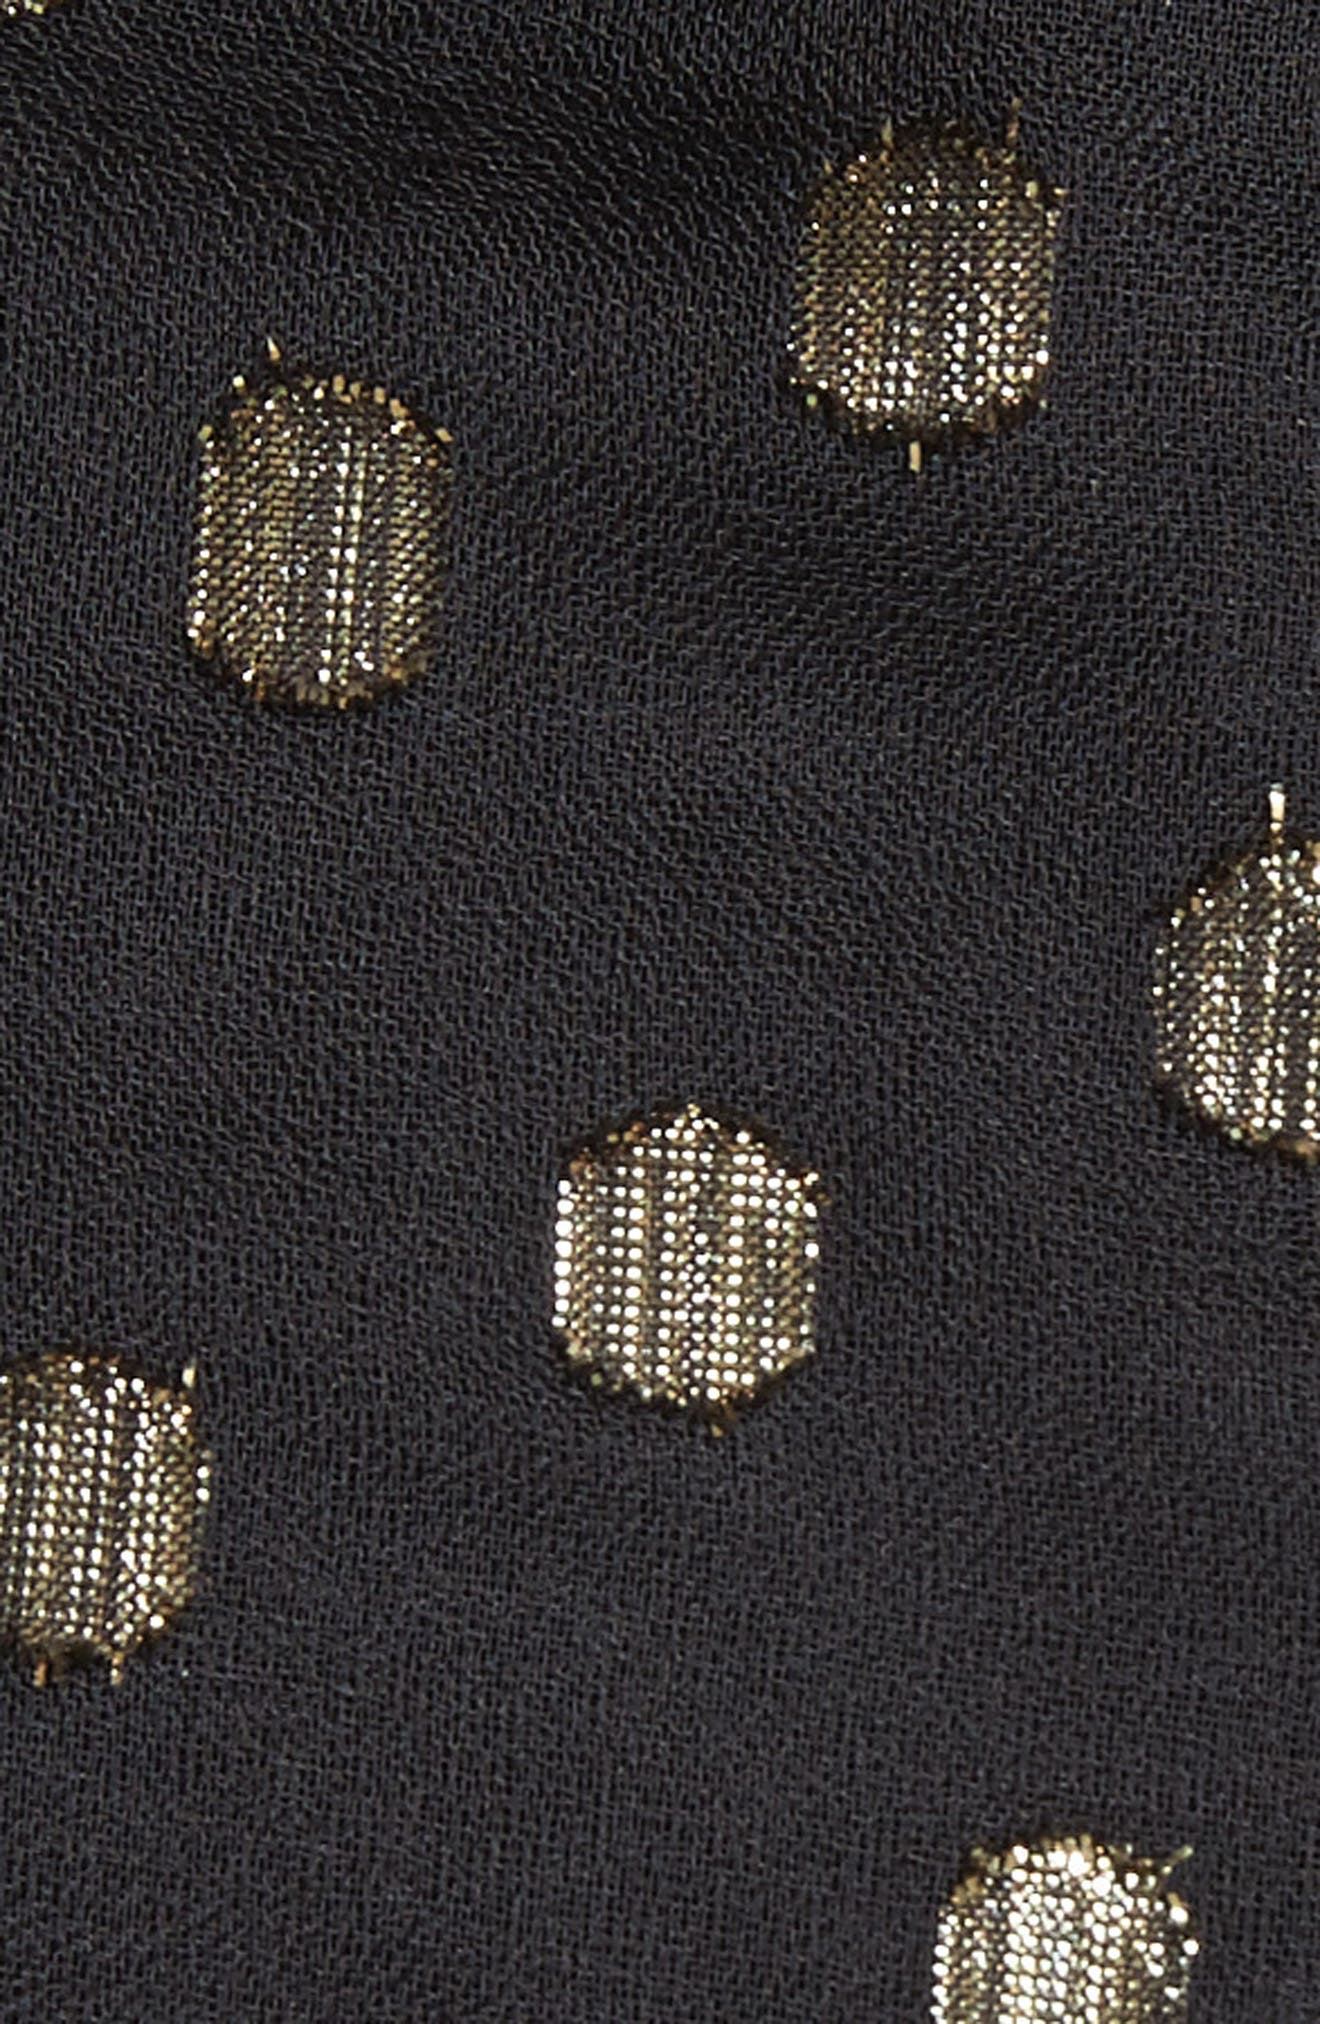 Metallic Polka Dot Chain Strap Dress,                             Alternate thumbnail 5, color,                             004